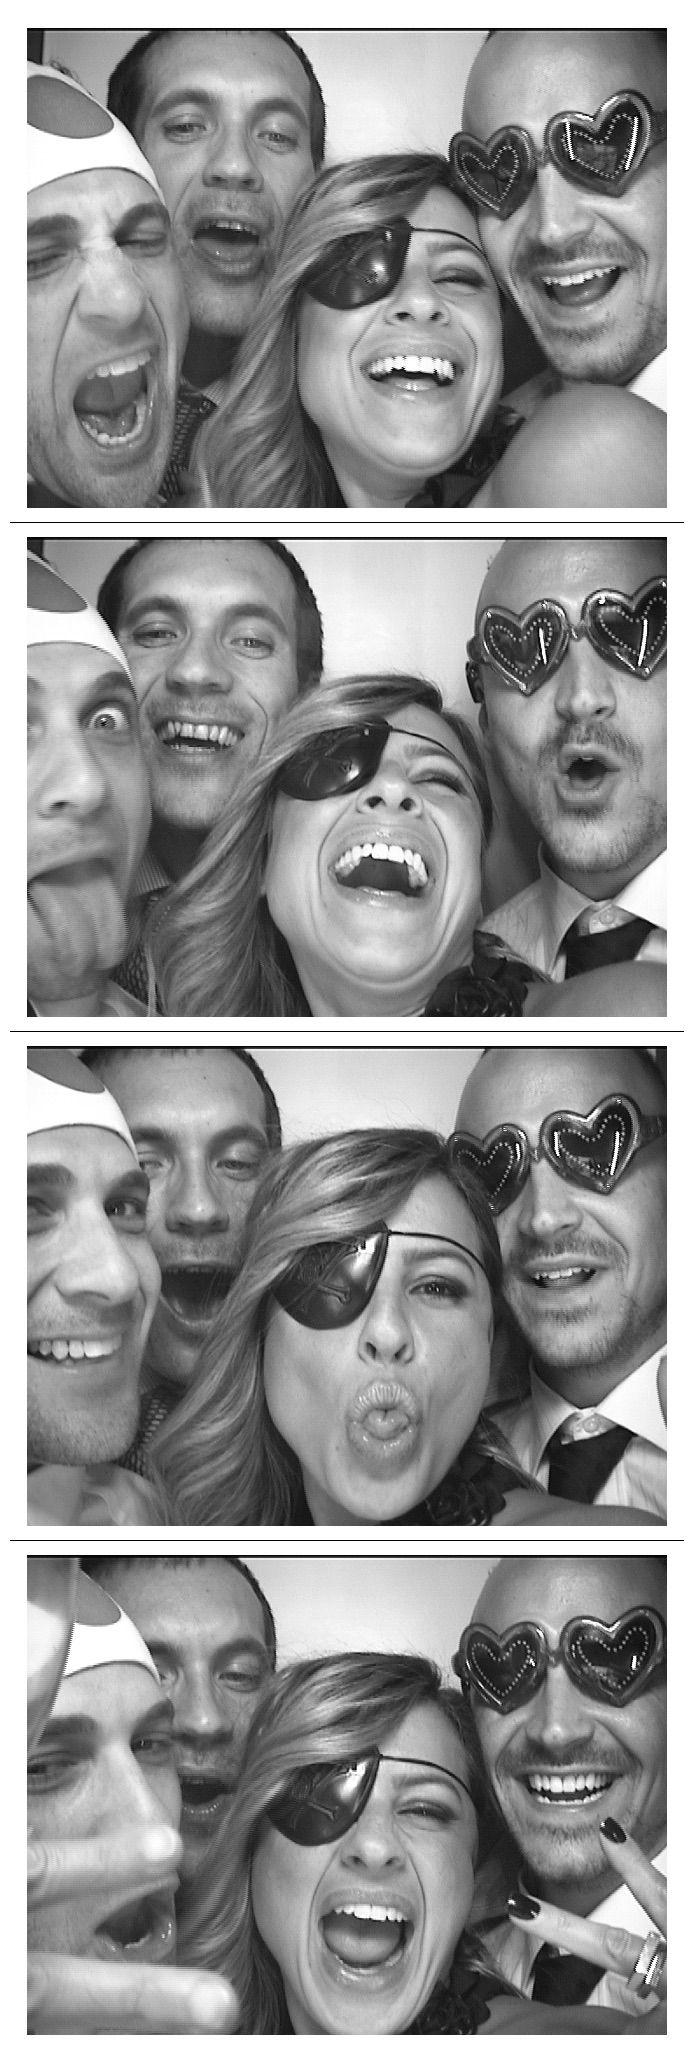 party photobooth hire   www.flashbackphotobooths.com.au